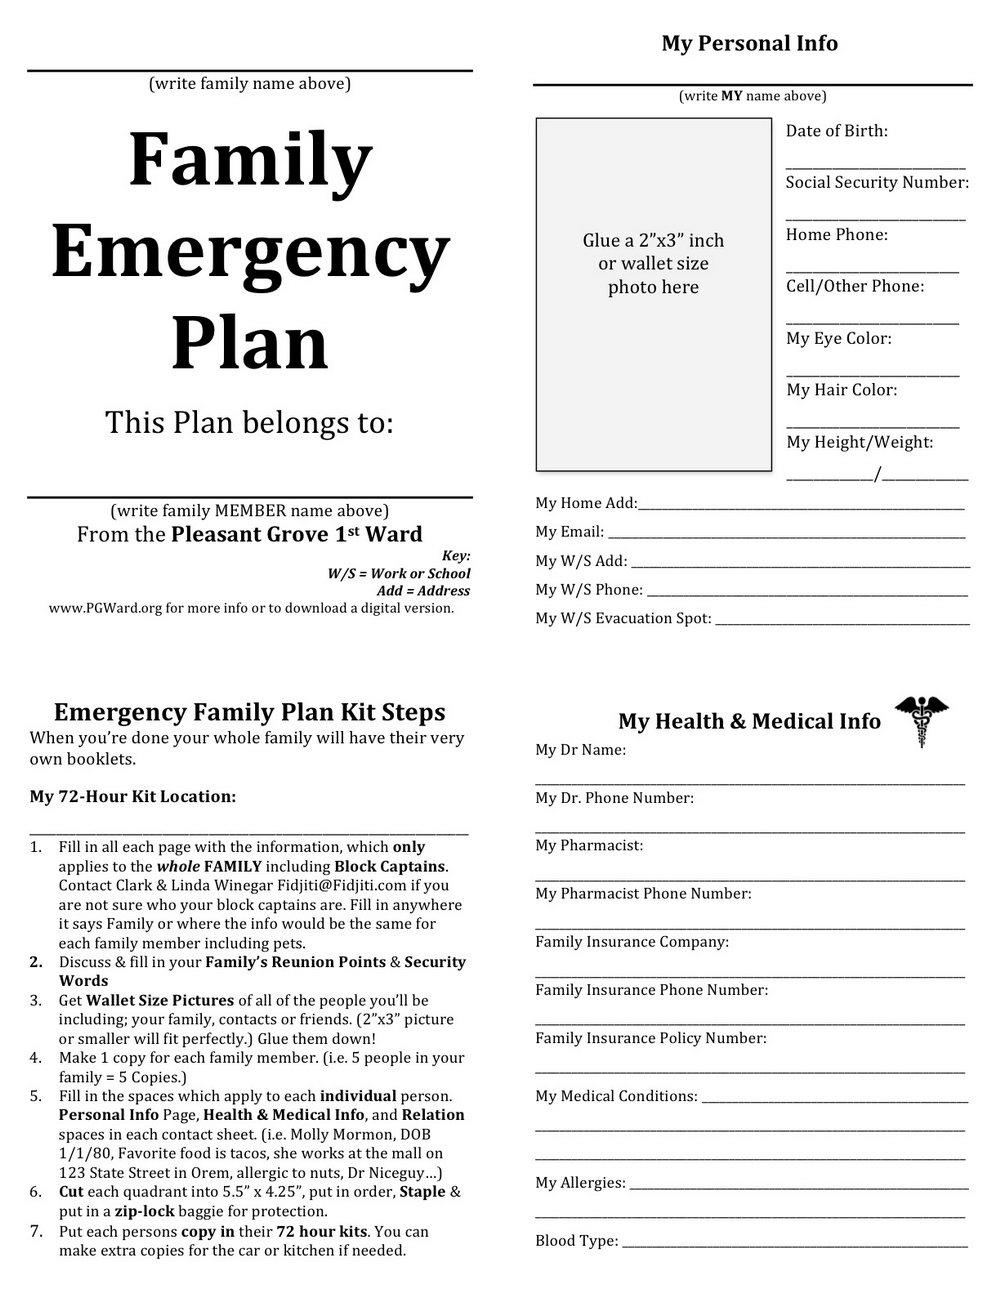 Emergency Preparedness Plan Template For Home